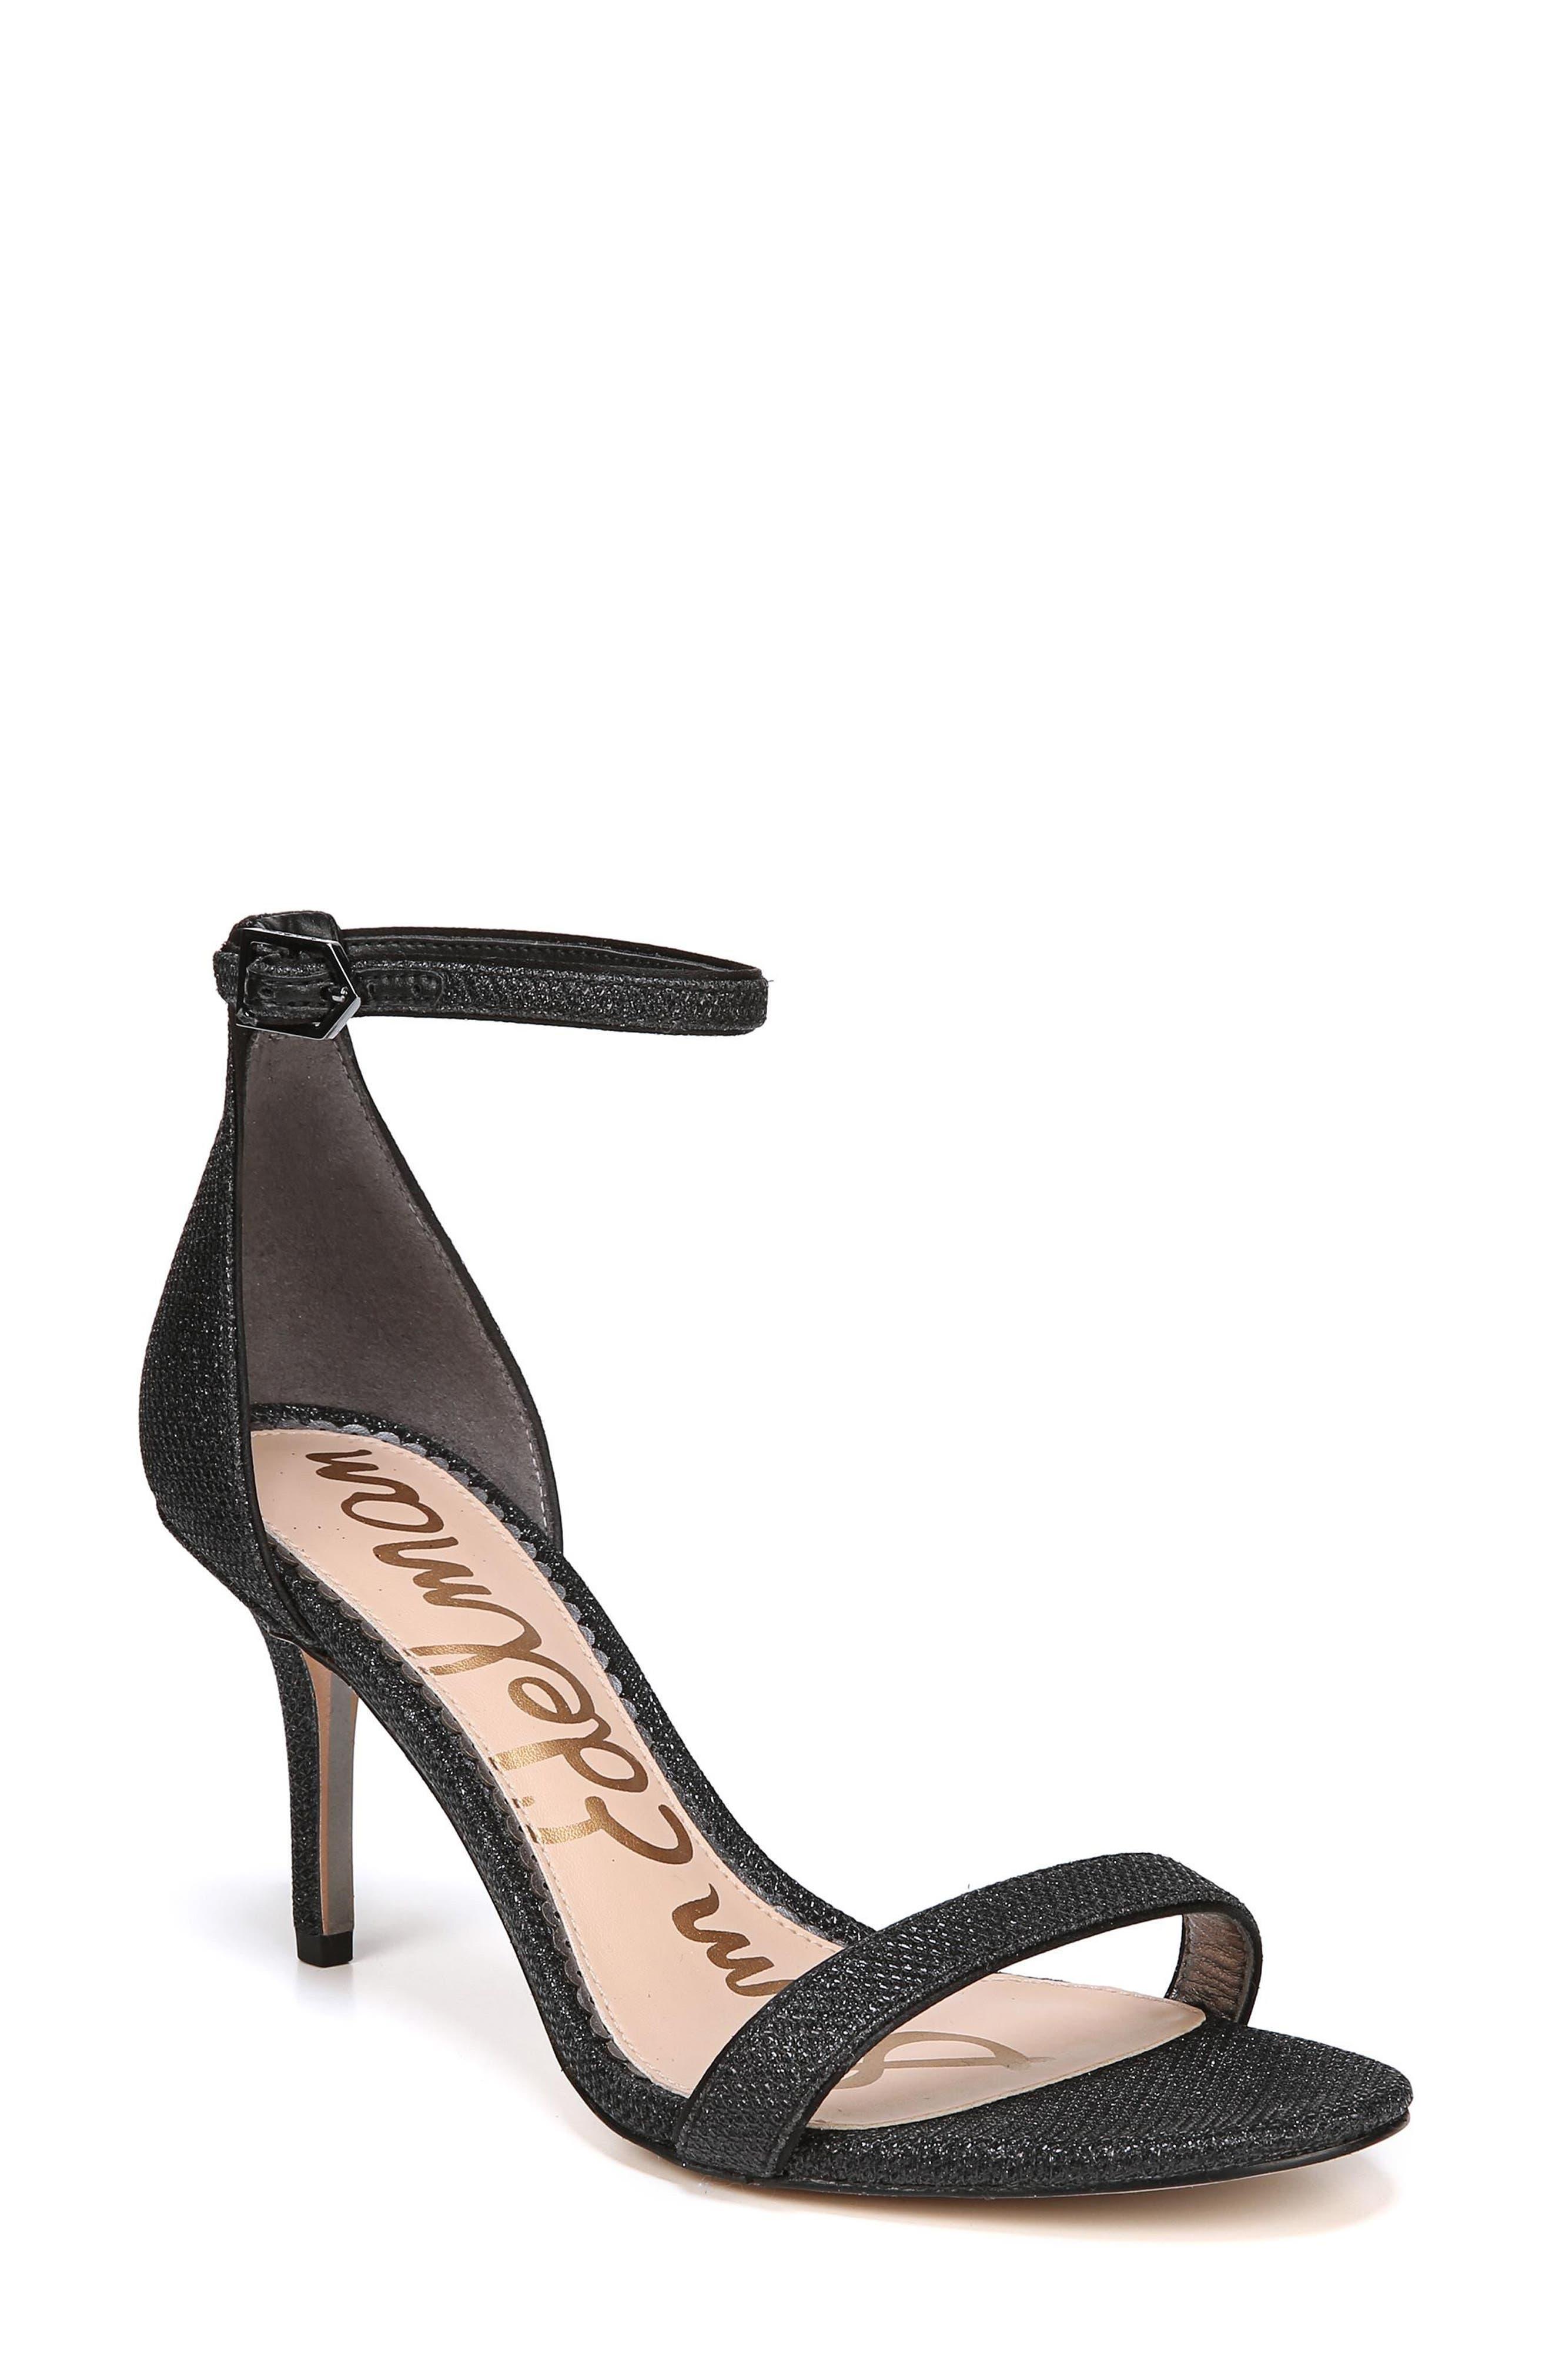 ,                             'Patti' Ankle Strap Sandal,                             Main thumbnail 1, color,                             003